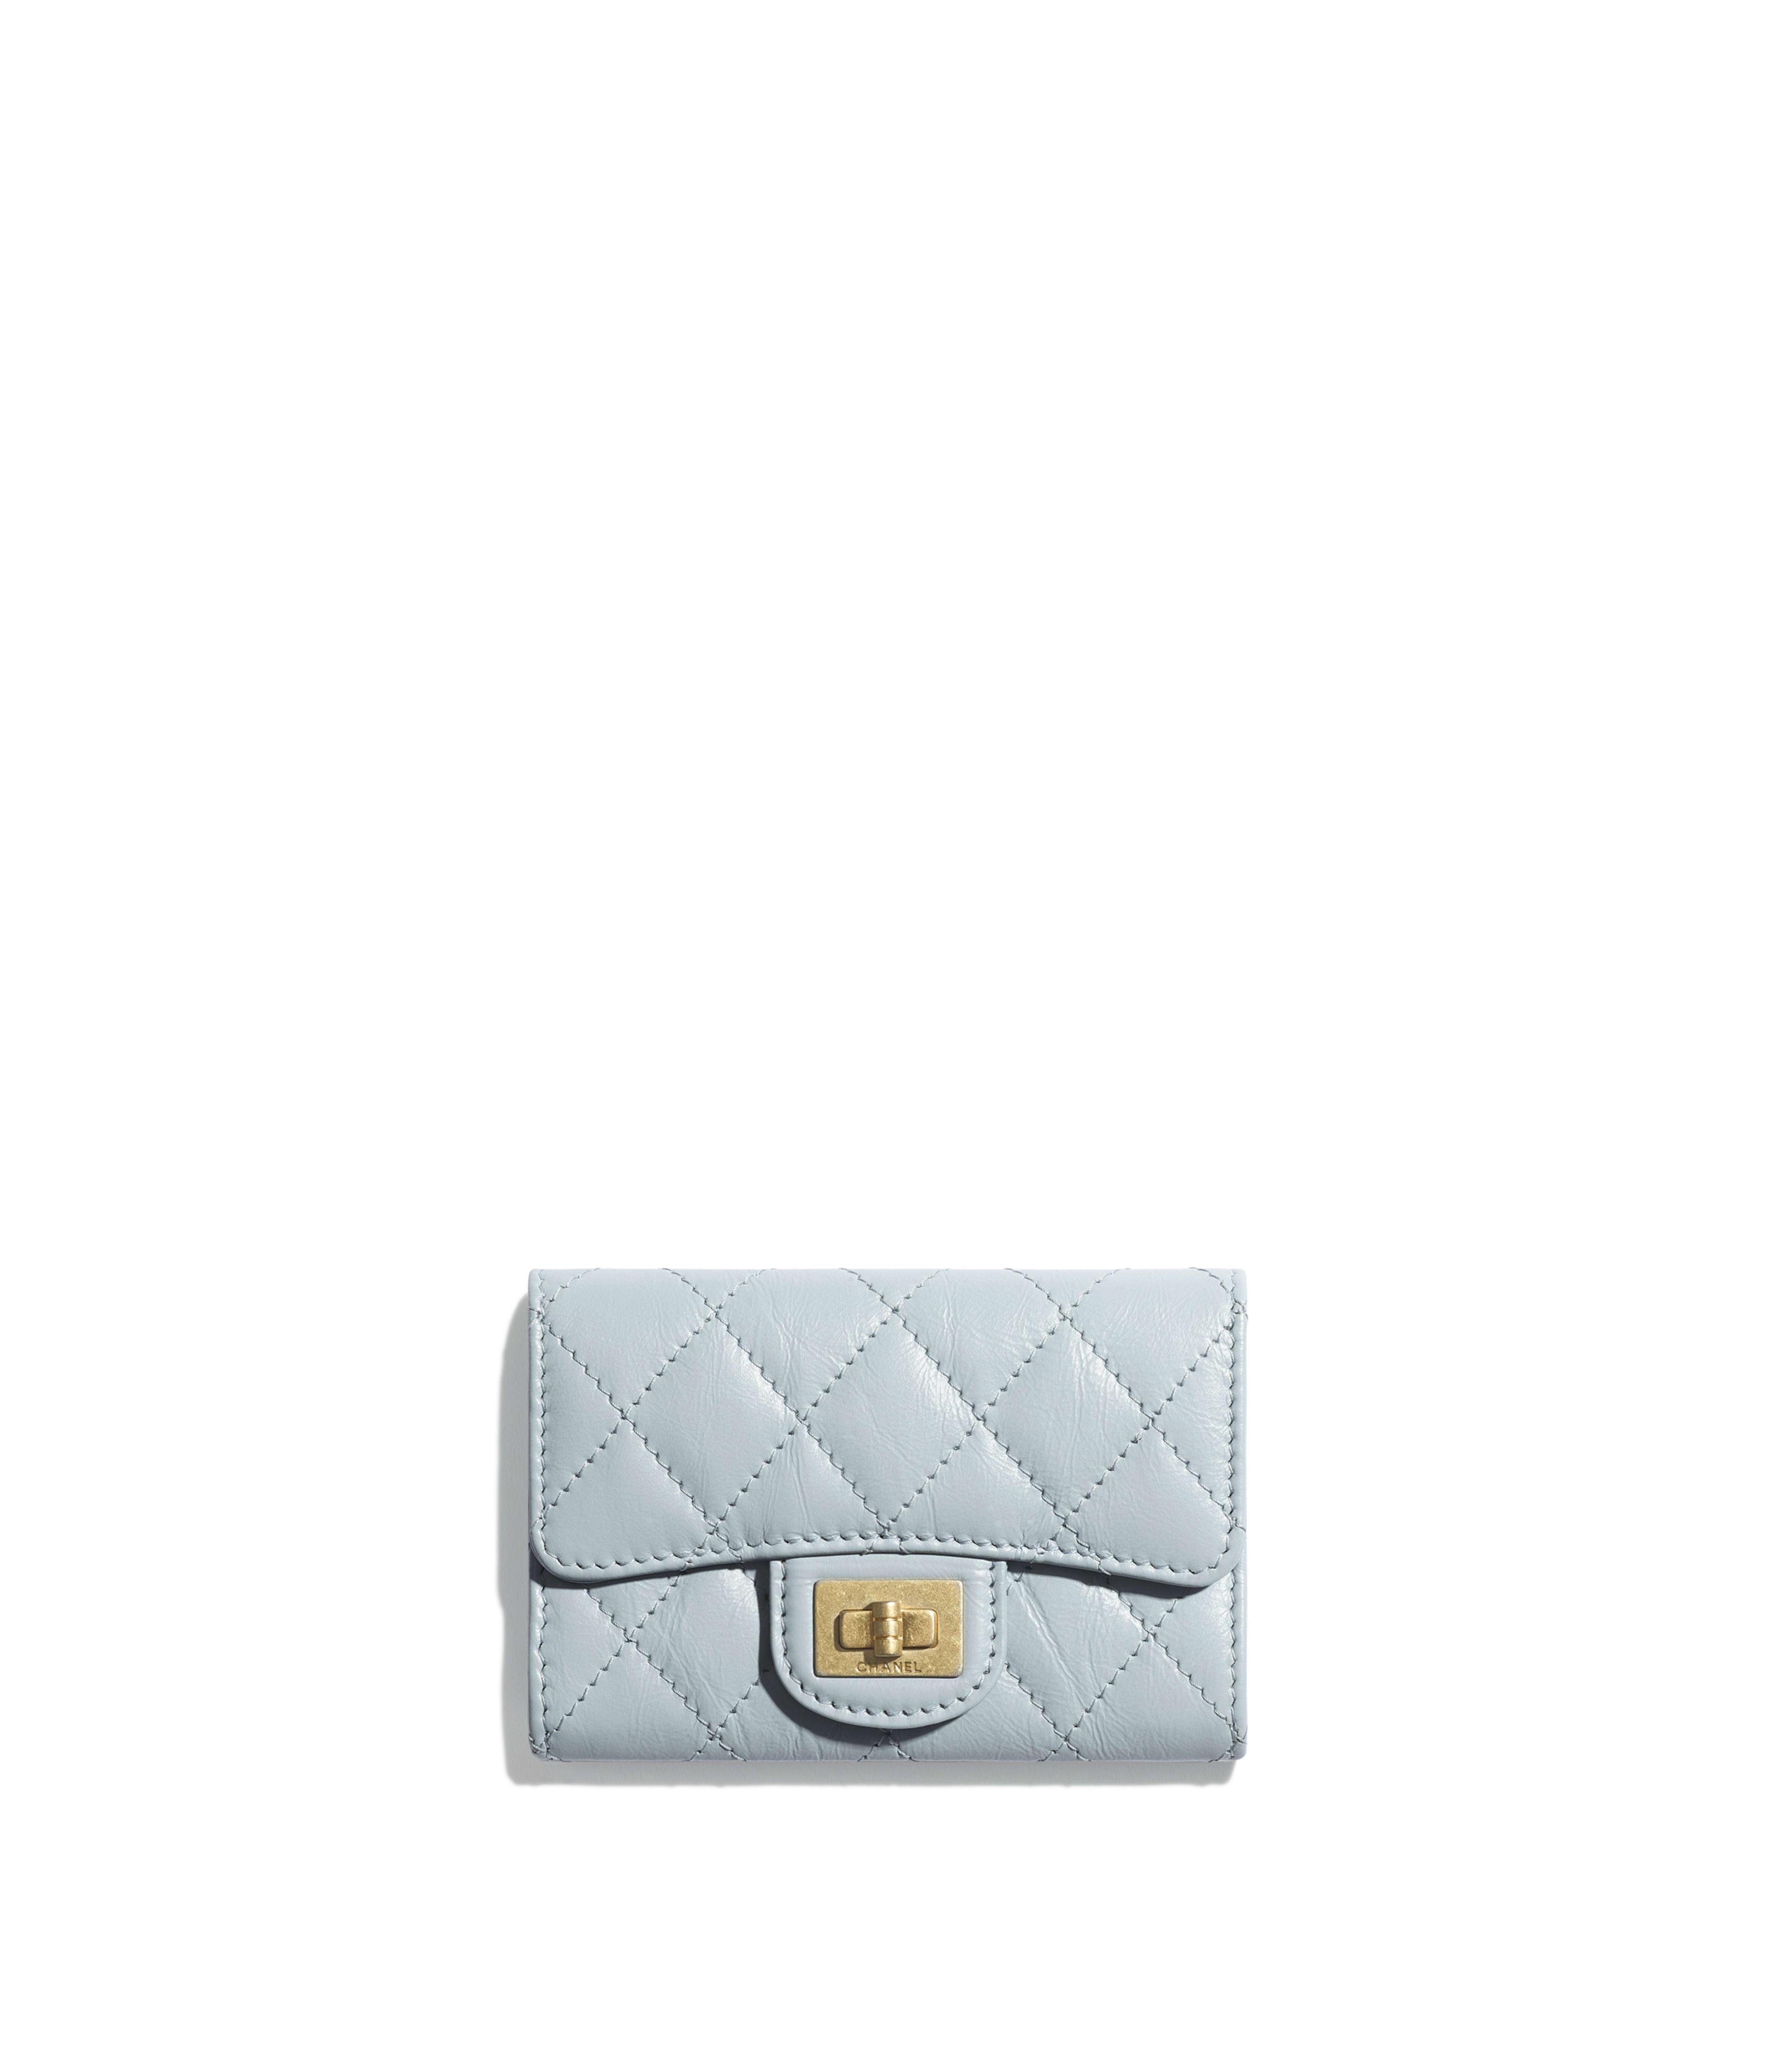 6e60384ad045 2.55 Flap Card Holder Aged Calfskin & Gold-Tone Metal, Light Blue Ref.  A80831Y04634N0428